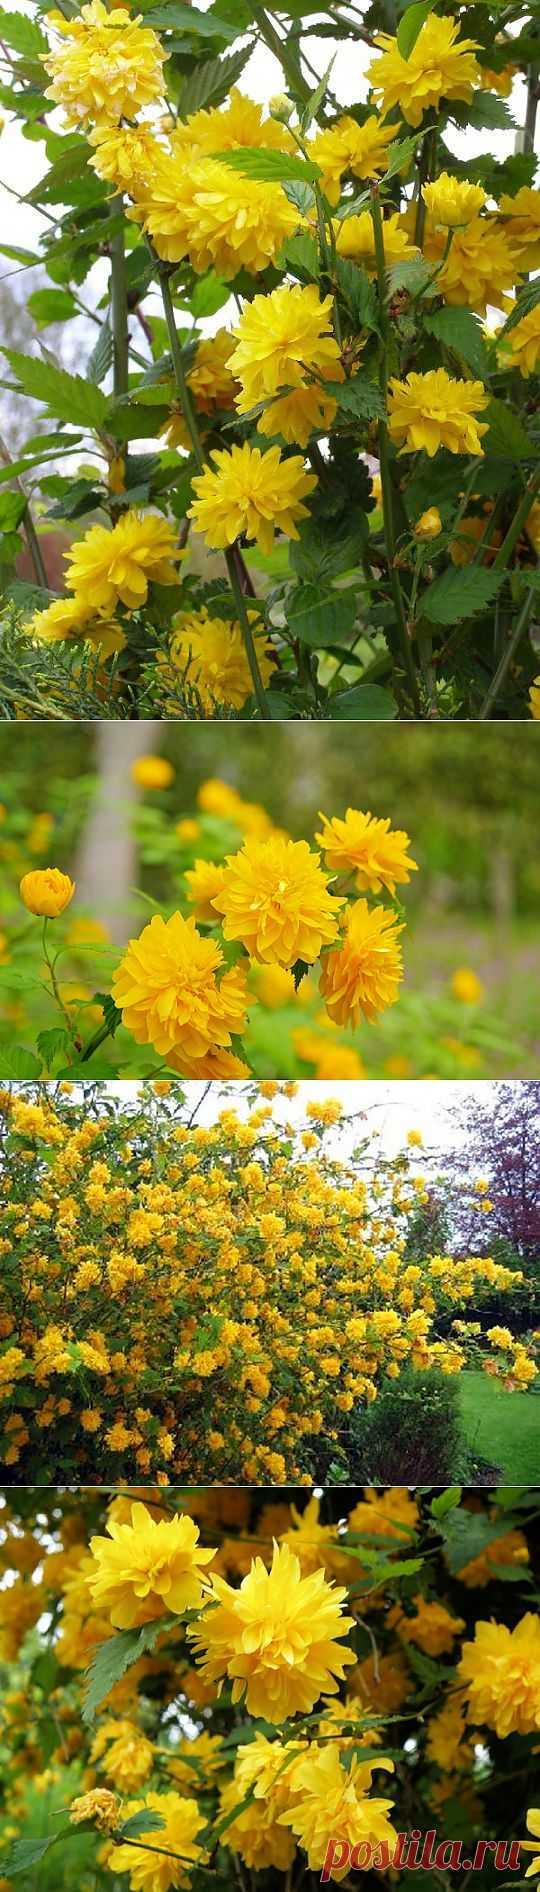 Keriya - the Japanese rose | 6 hundred parts